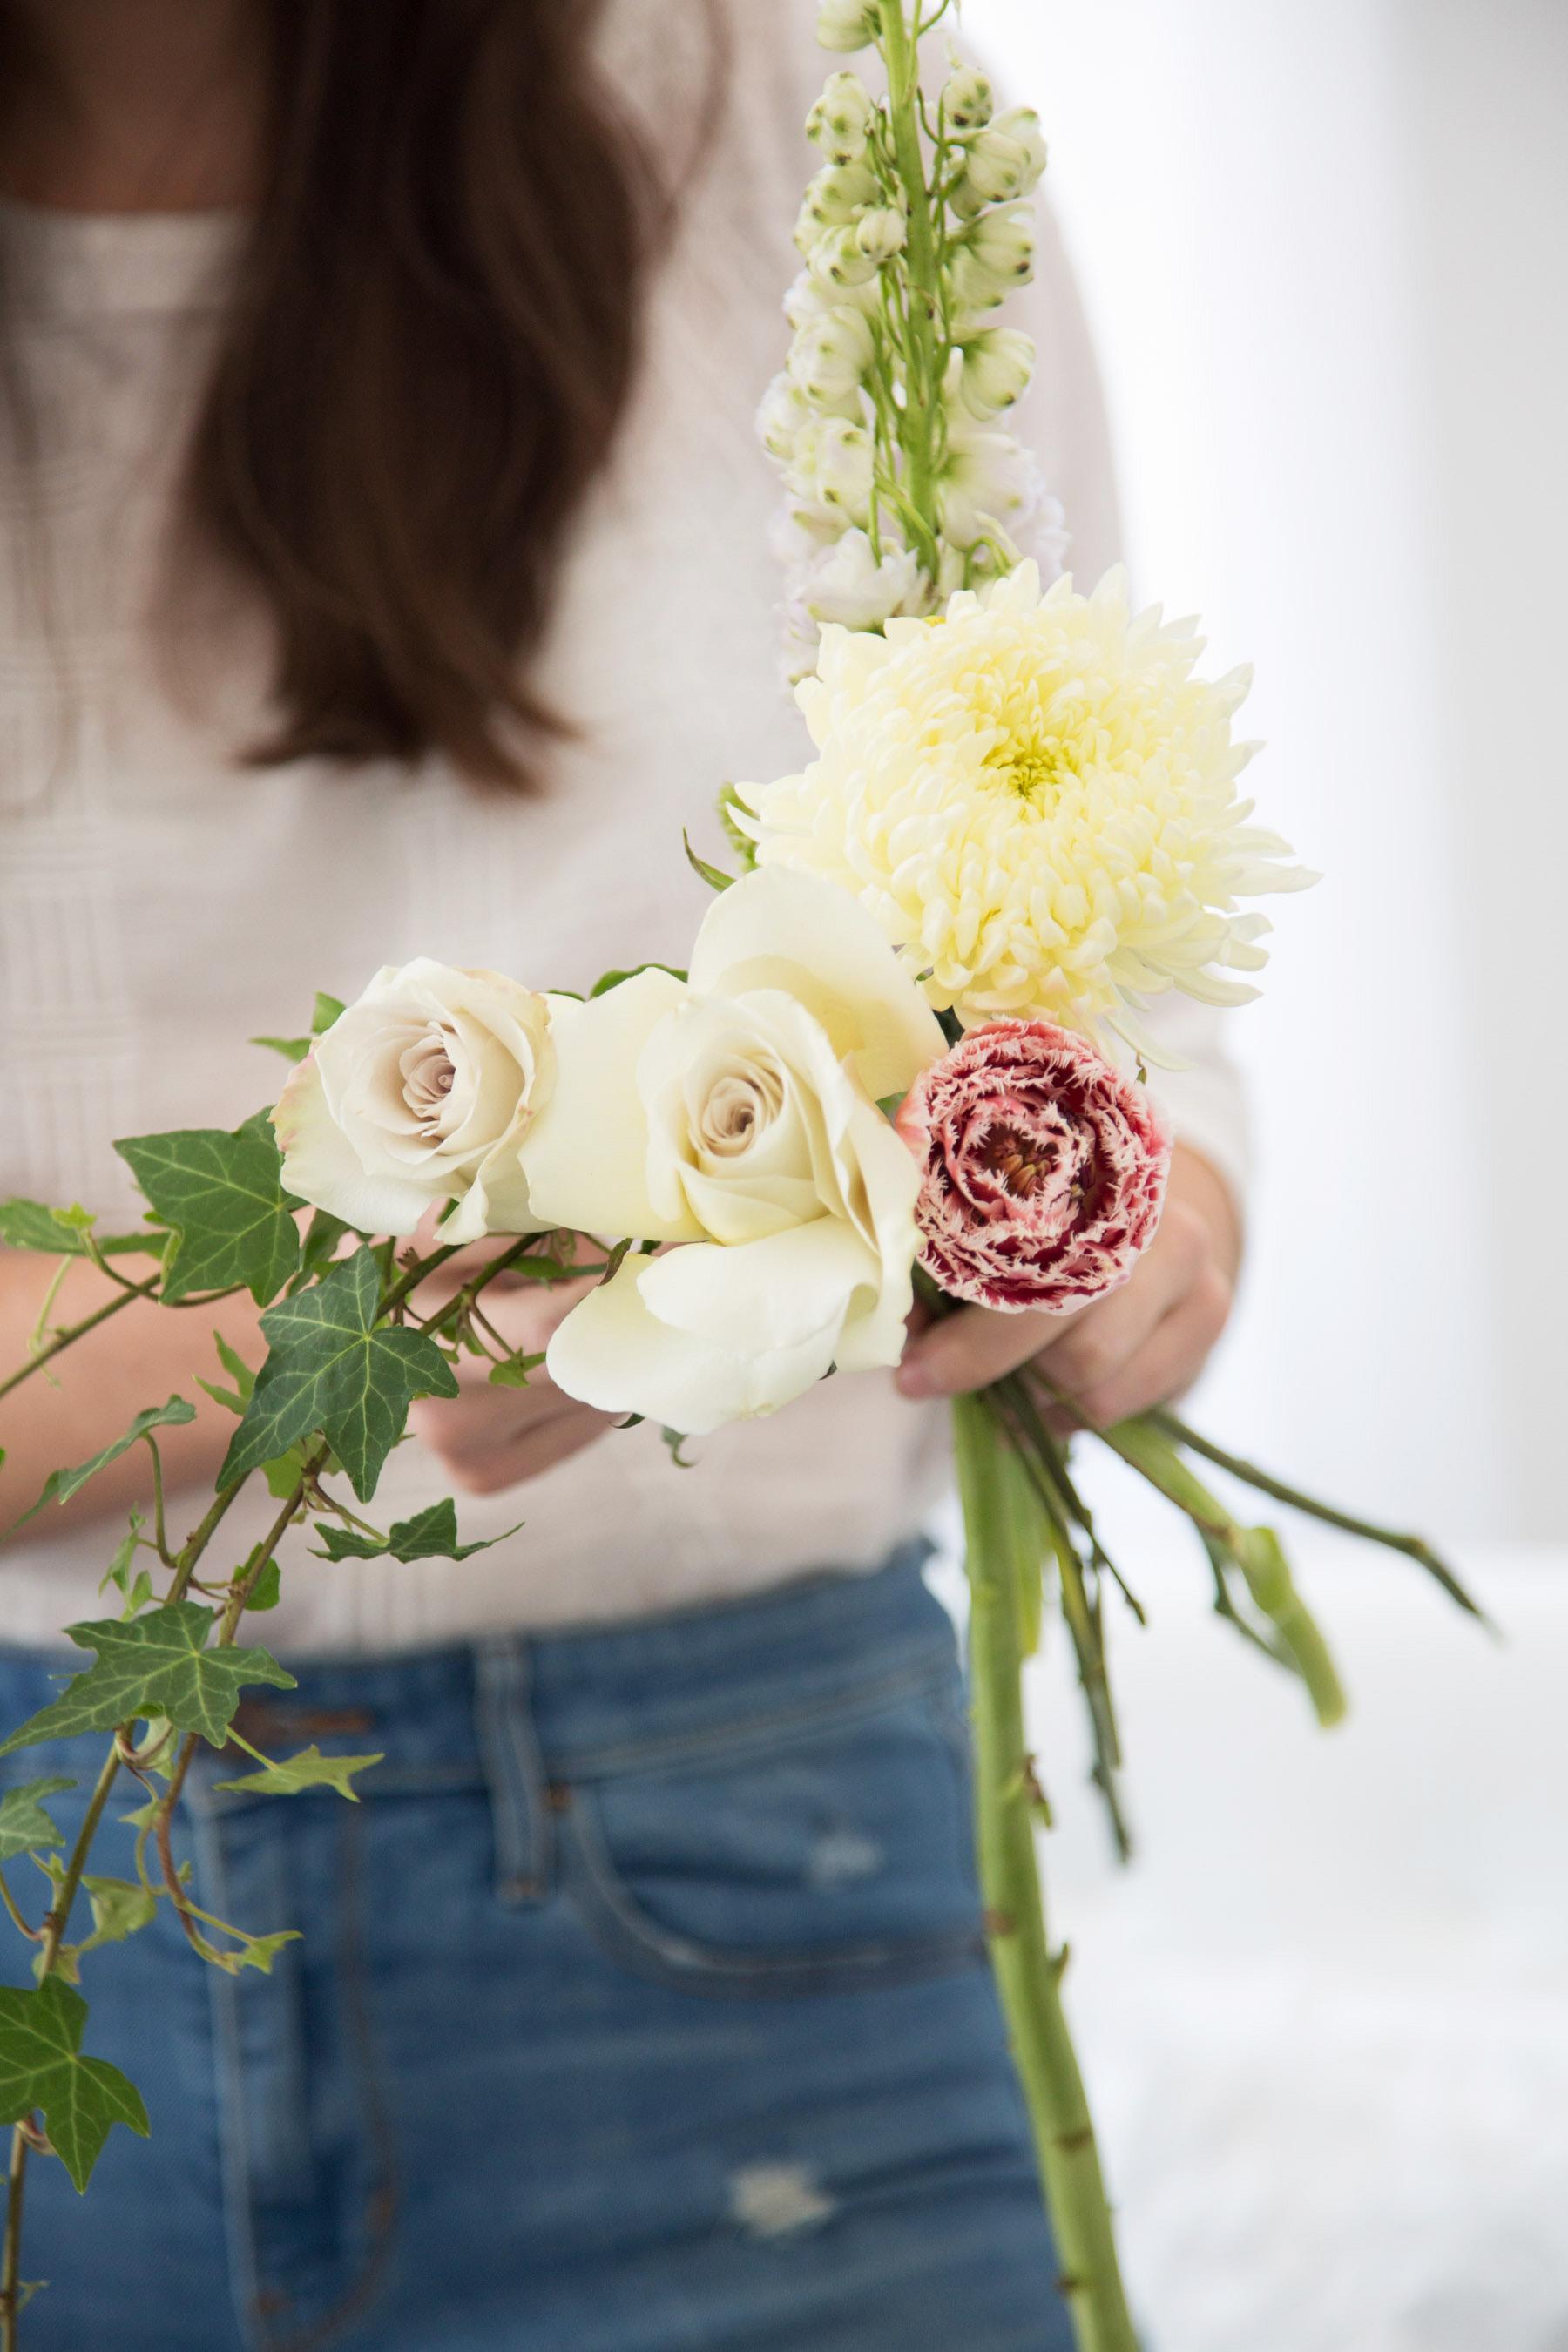 barrie flowers, barrie floral workshop, barrie social project, barrie social media, social media strategist, creative collaboration, barrie photography, shannon bellisle, forgather floral co, jennifer klemetti, handmade flower arrangement